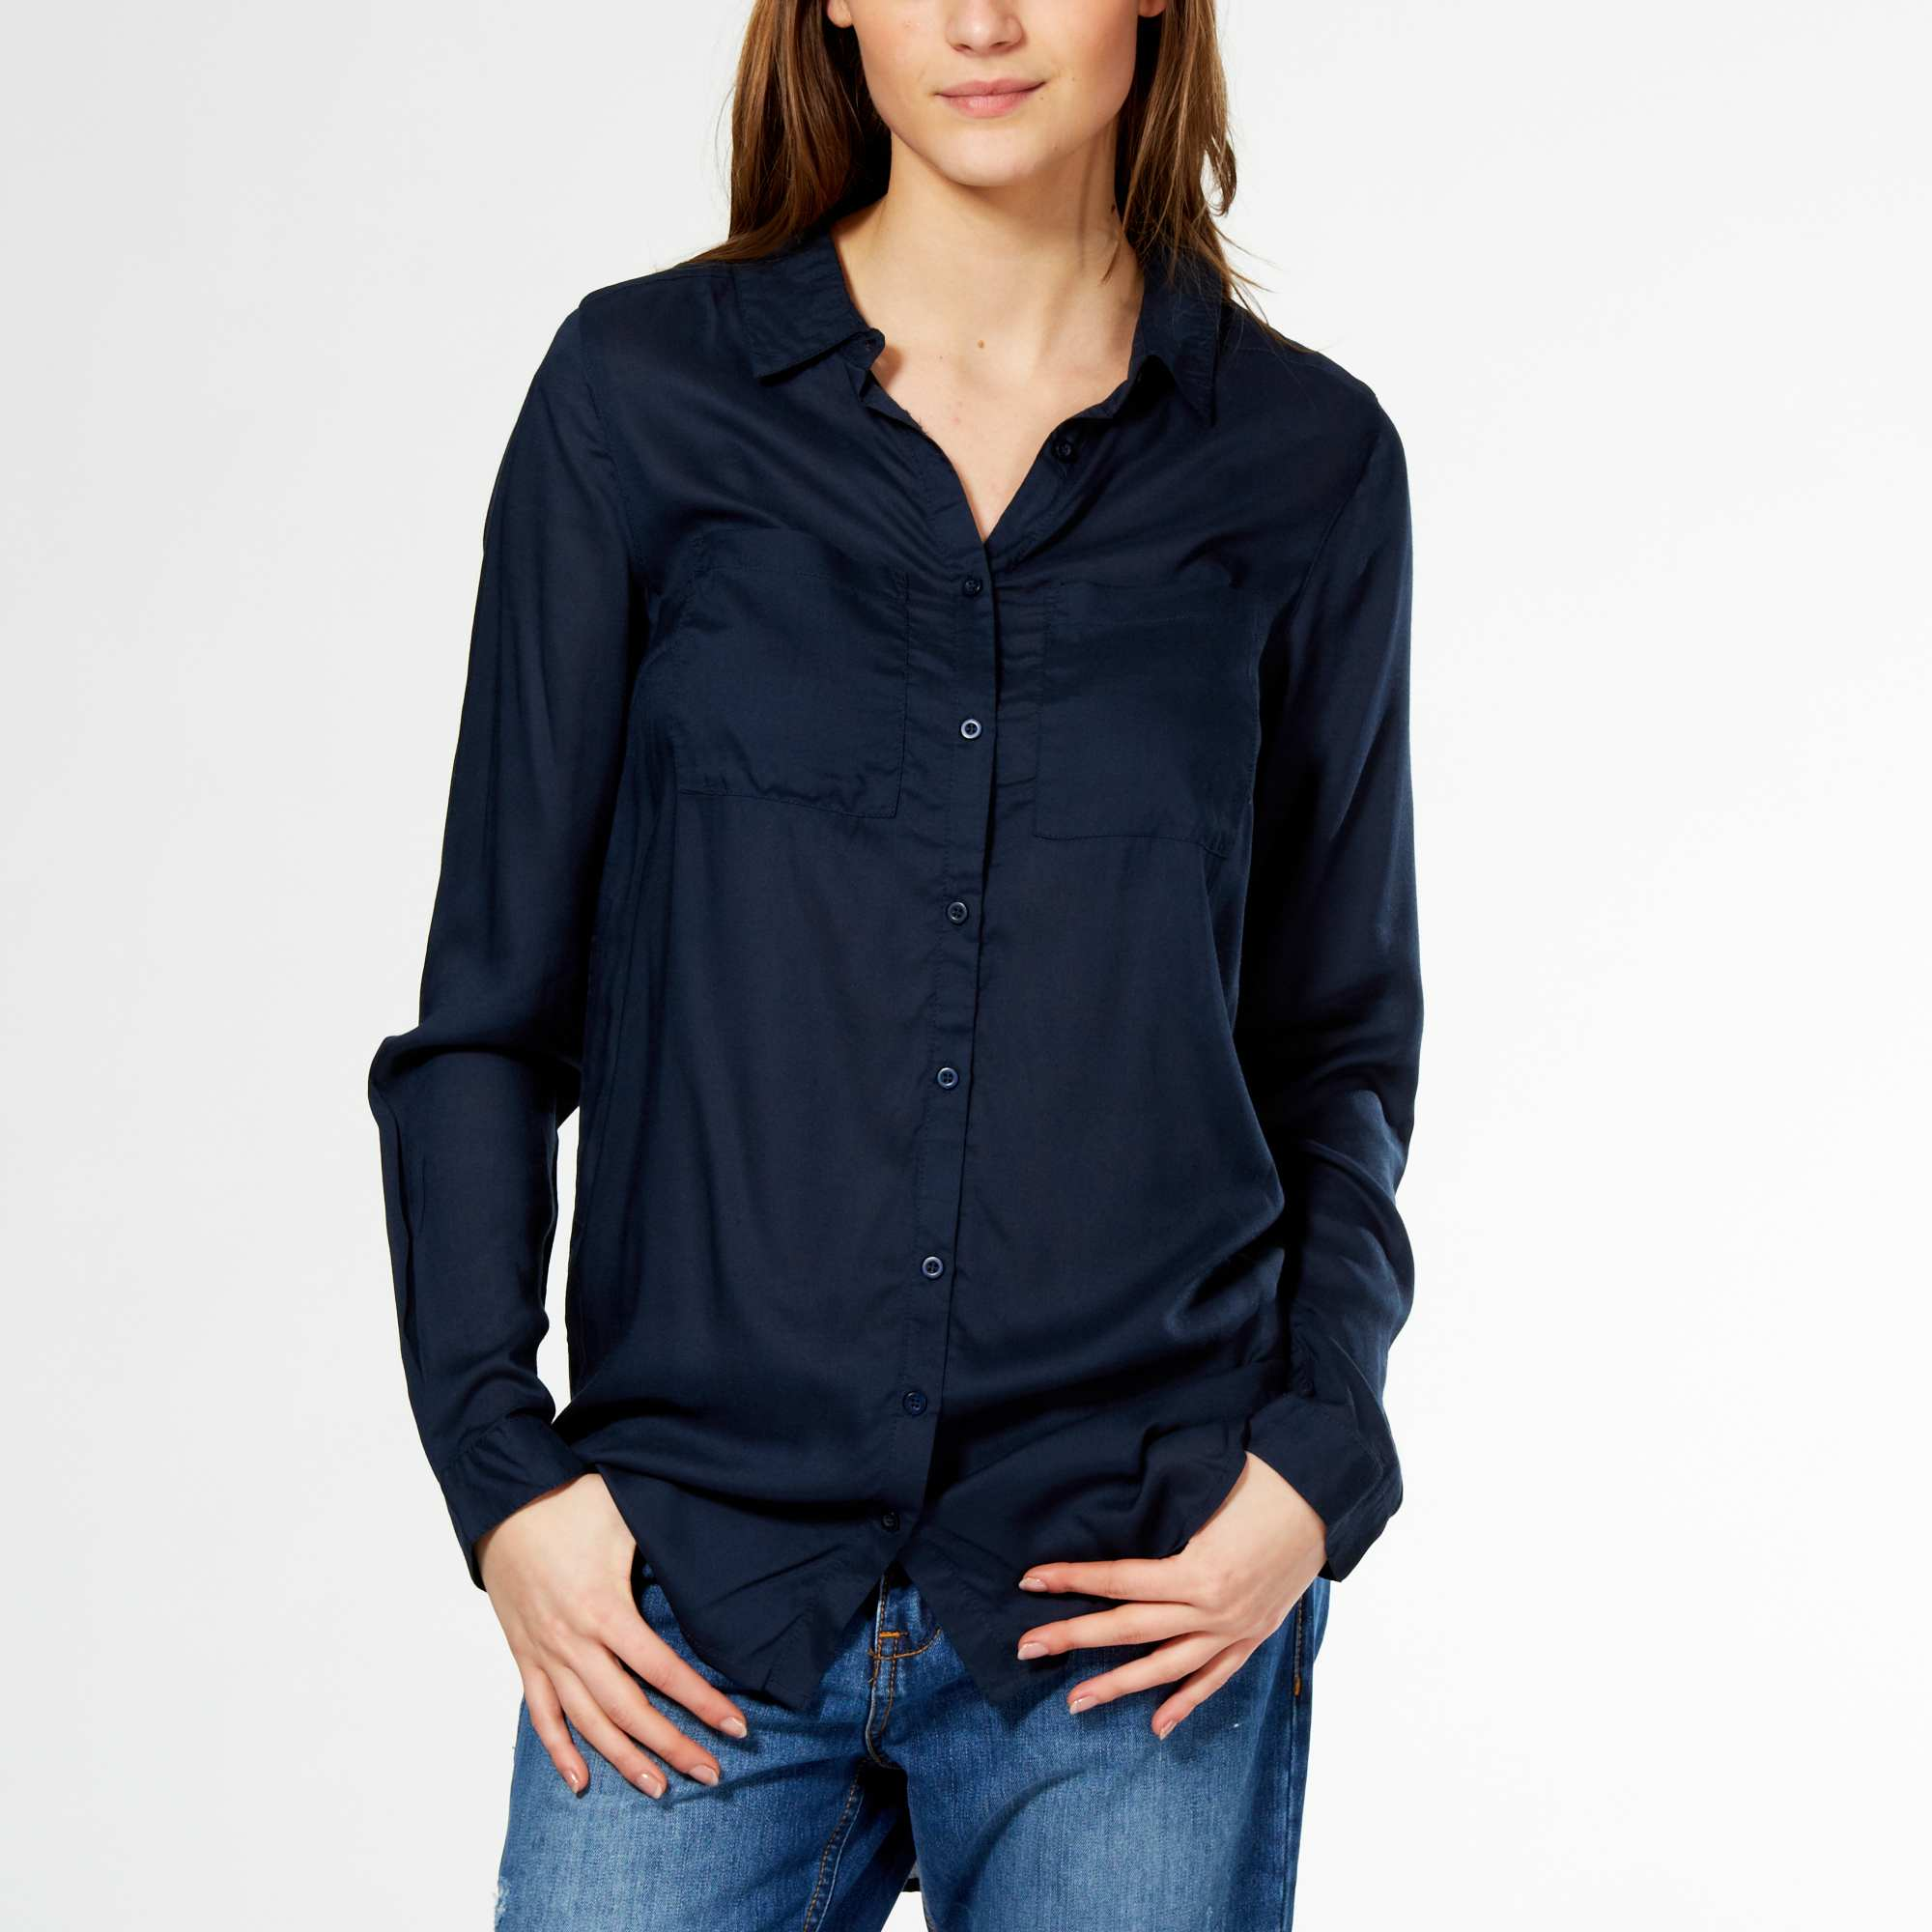 Chemise bleu marine femme - Chapka, doudoune, pull   Vetement d hiver b46cf05400dd